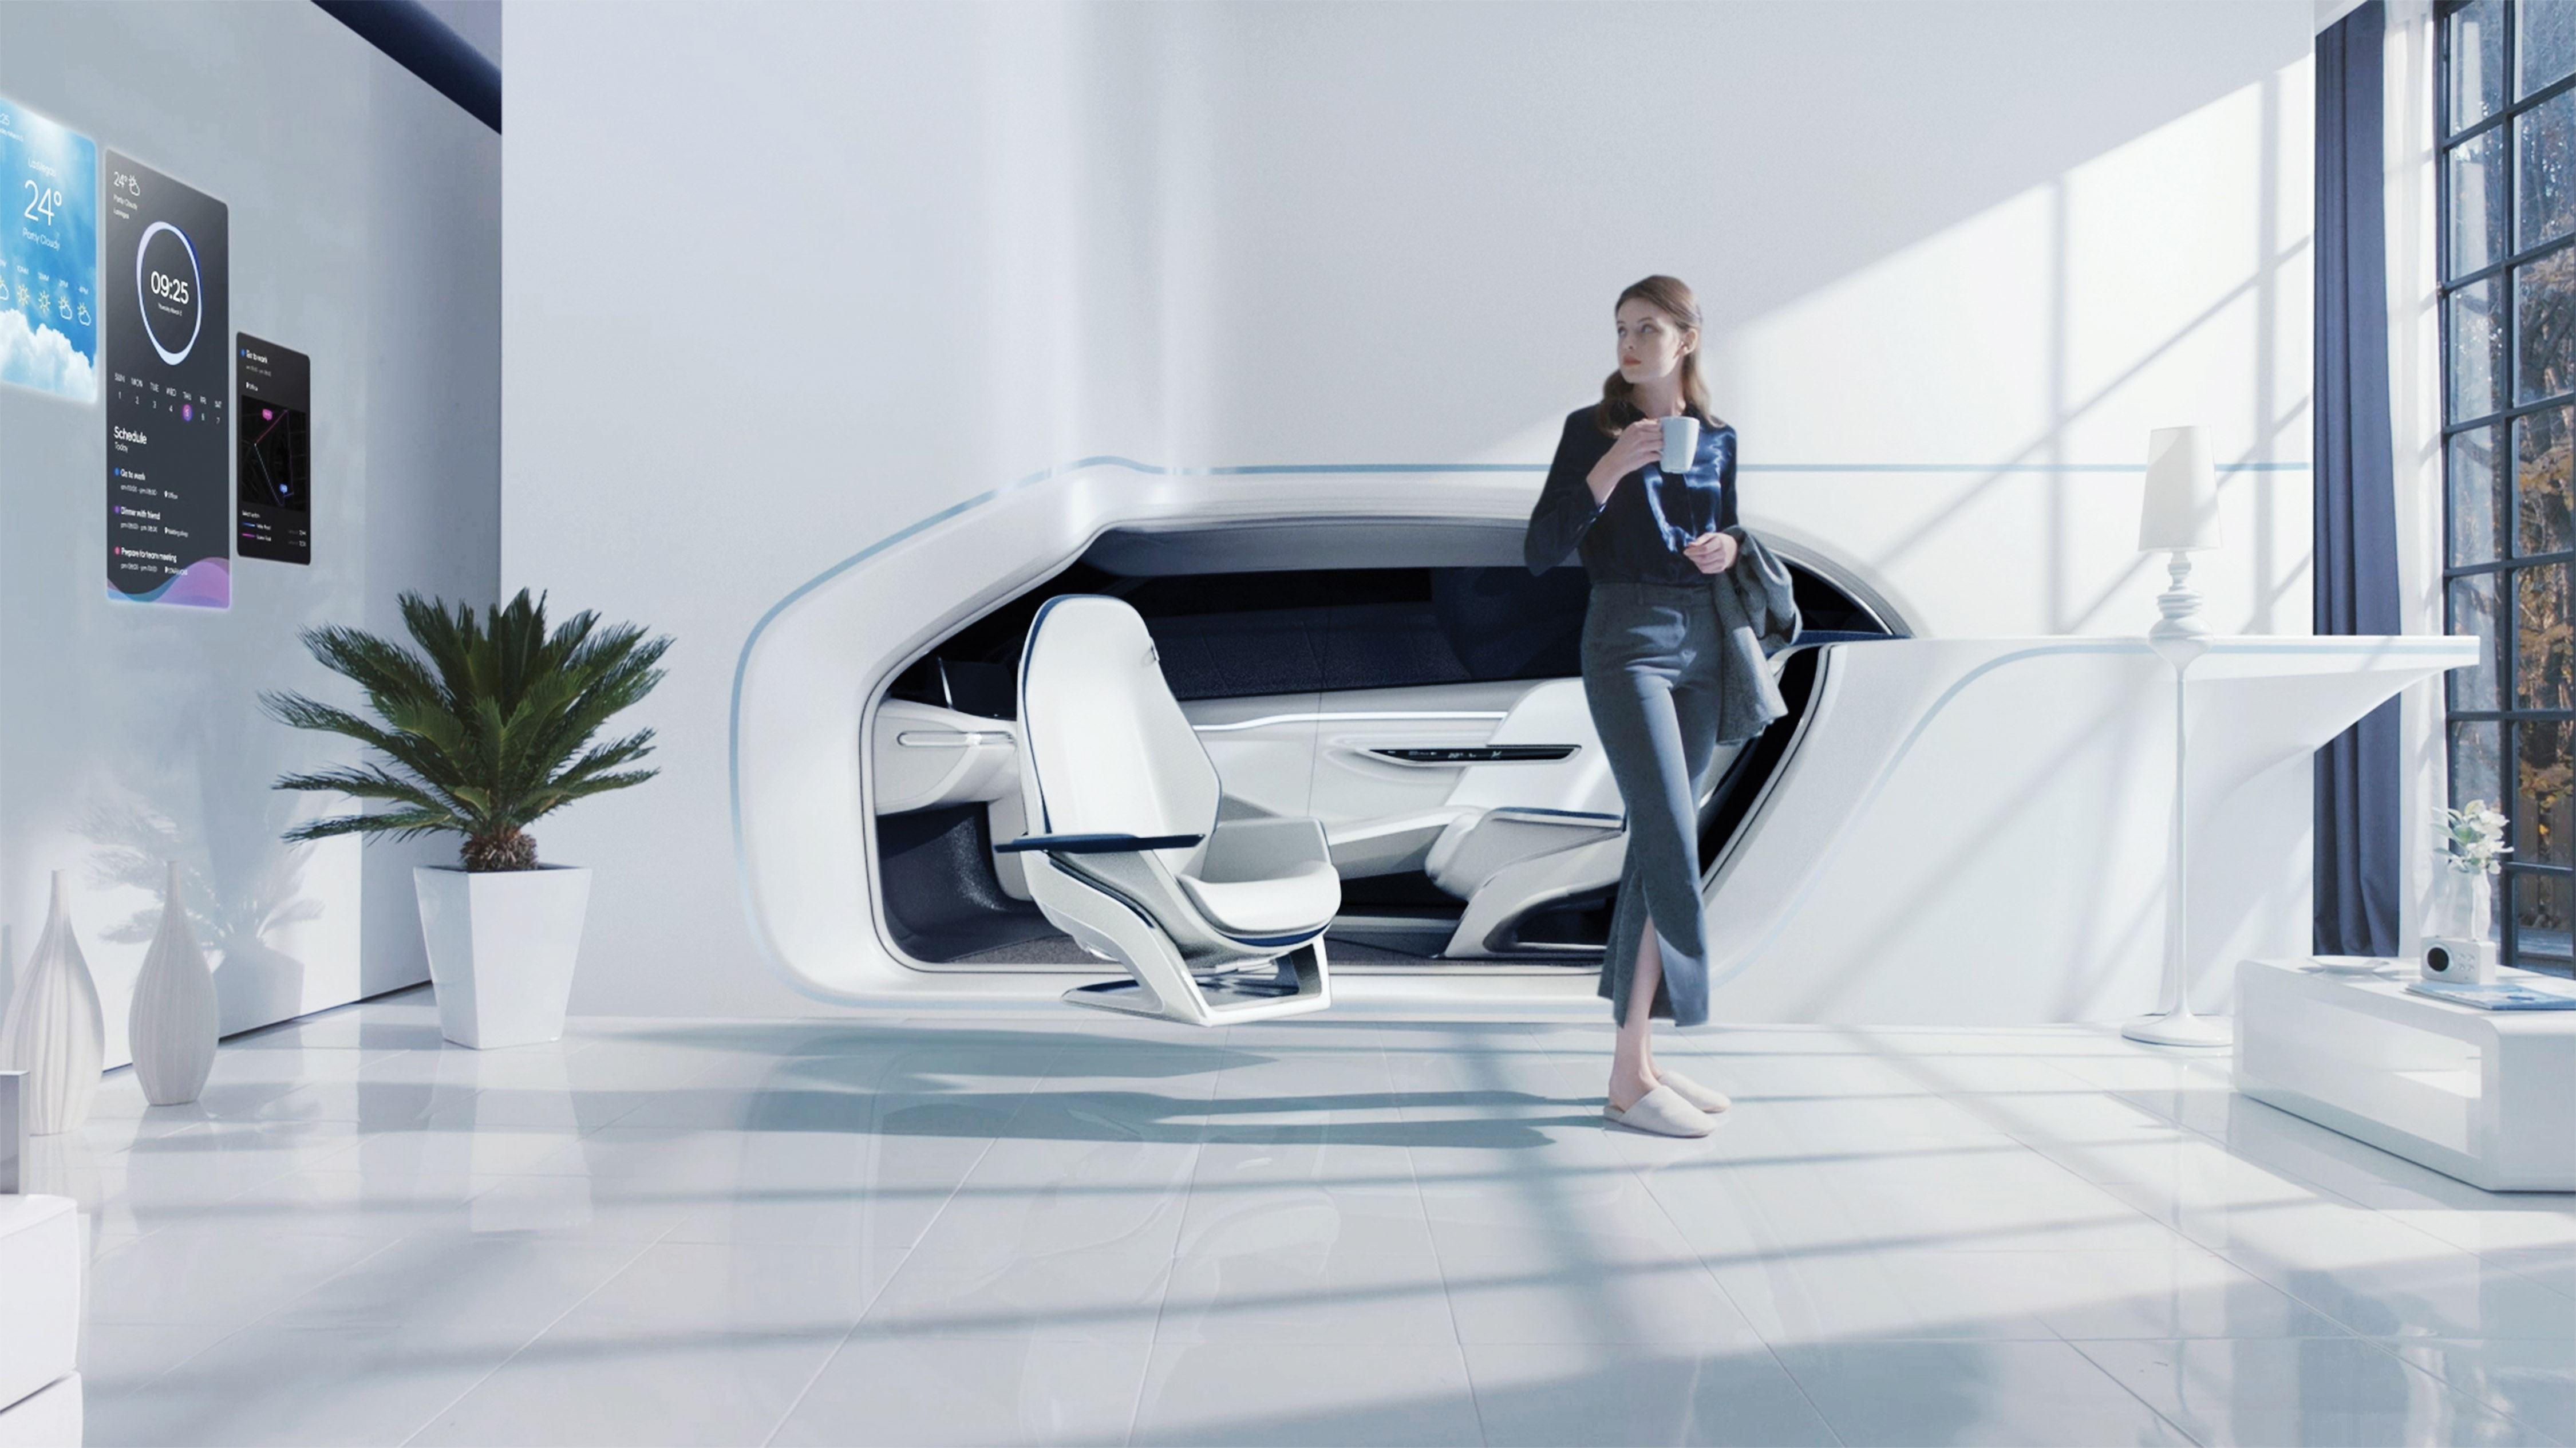 Hyundai toont visie op toekomstige mobiliteit tijdens Consumer Electronics Show 2017 in Las Vegas.